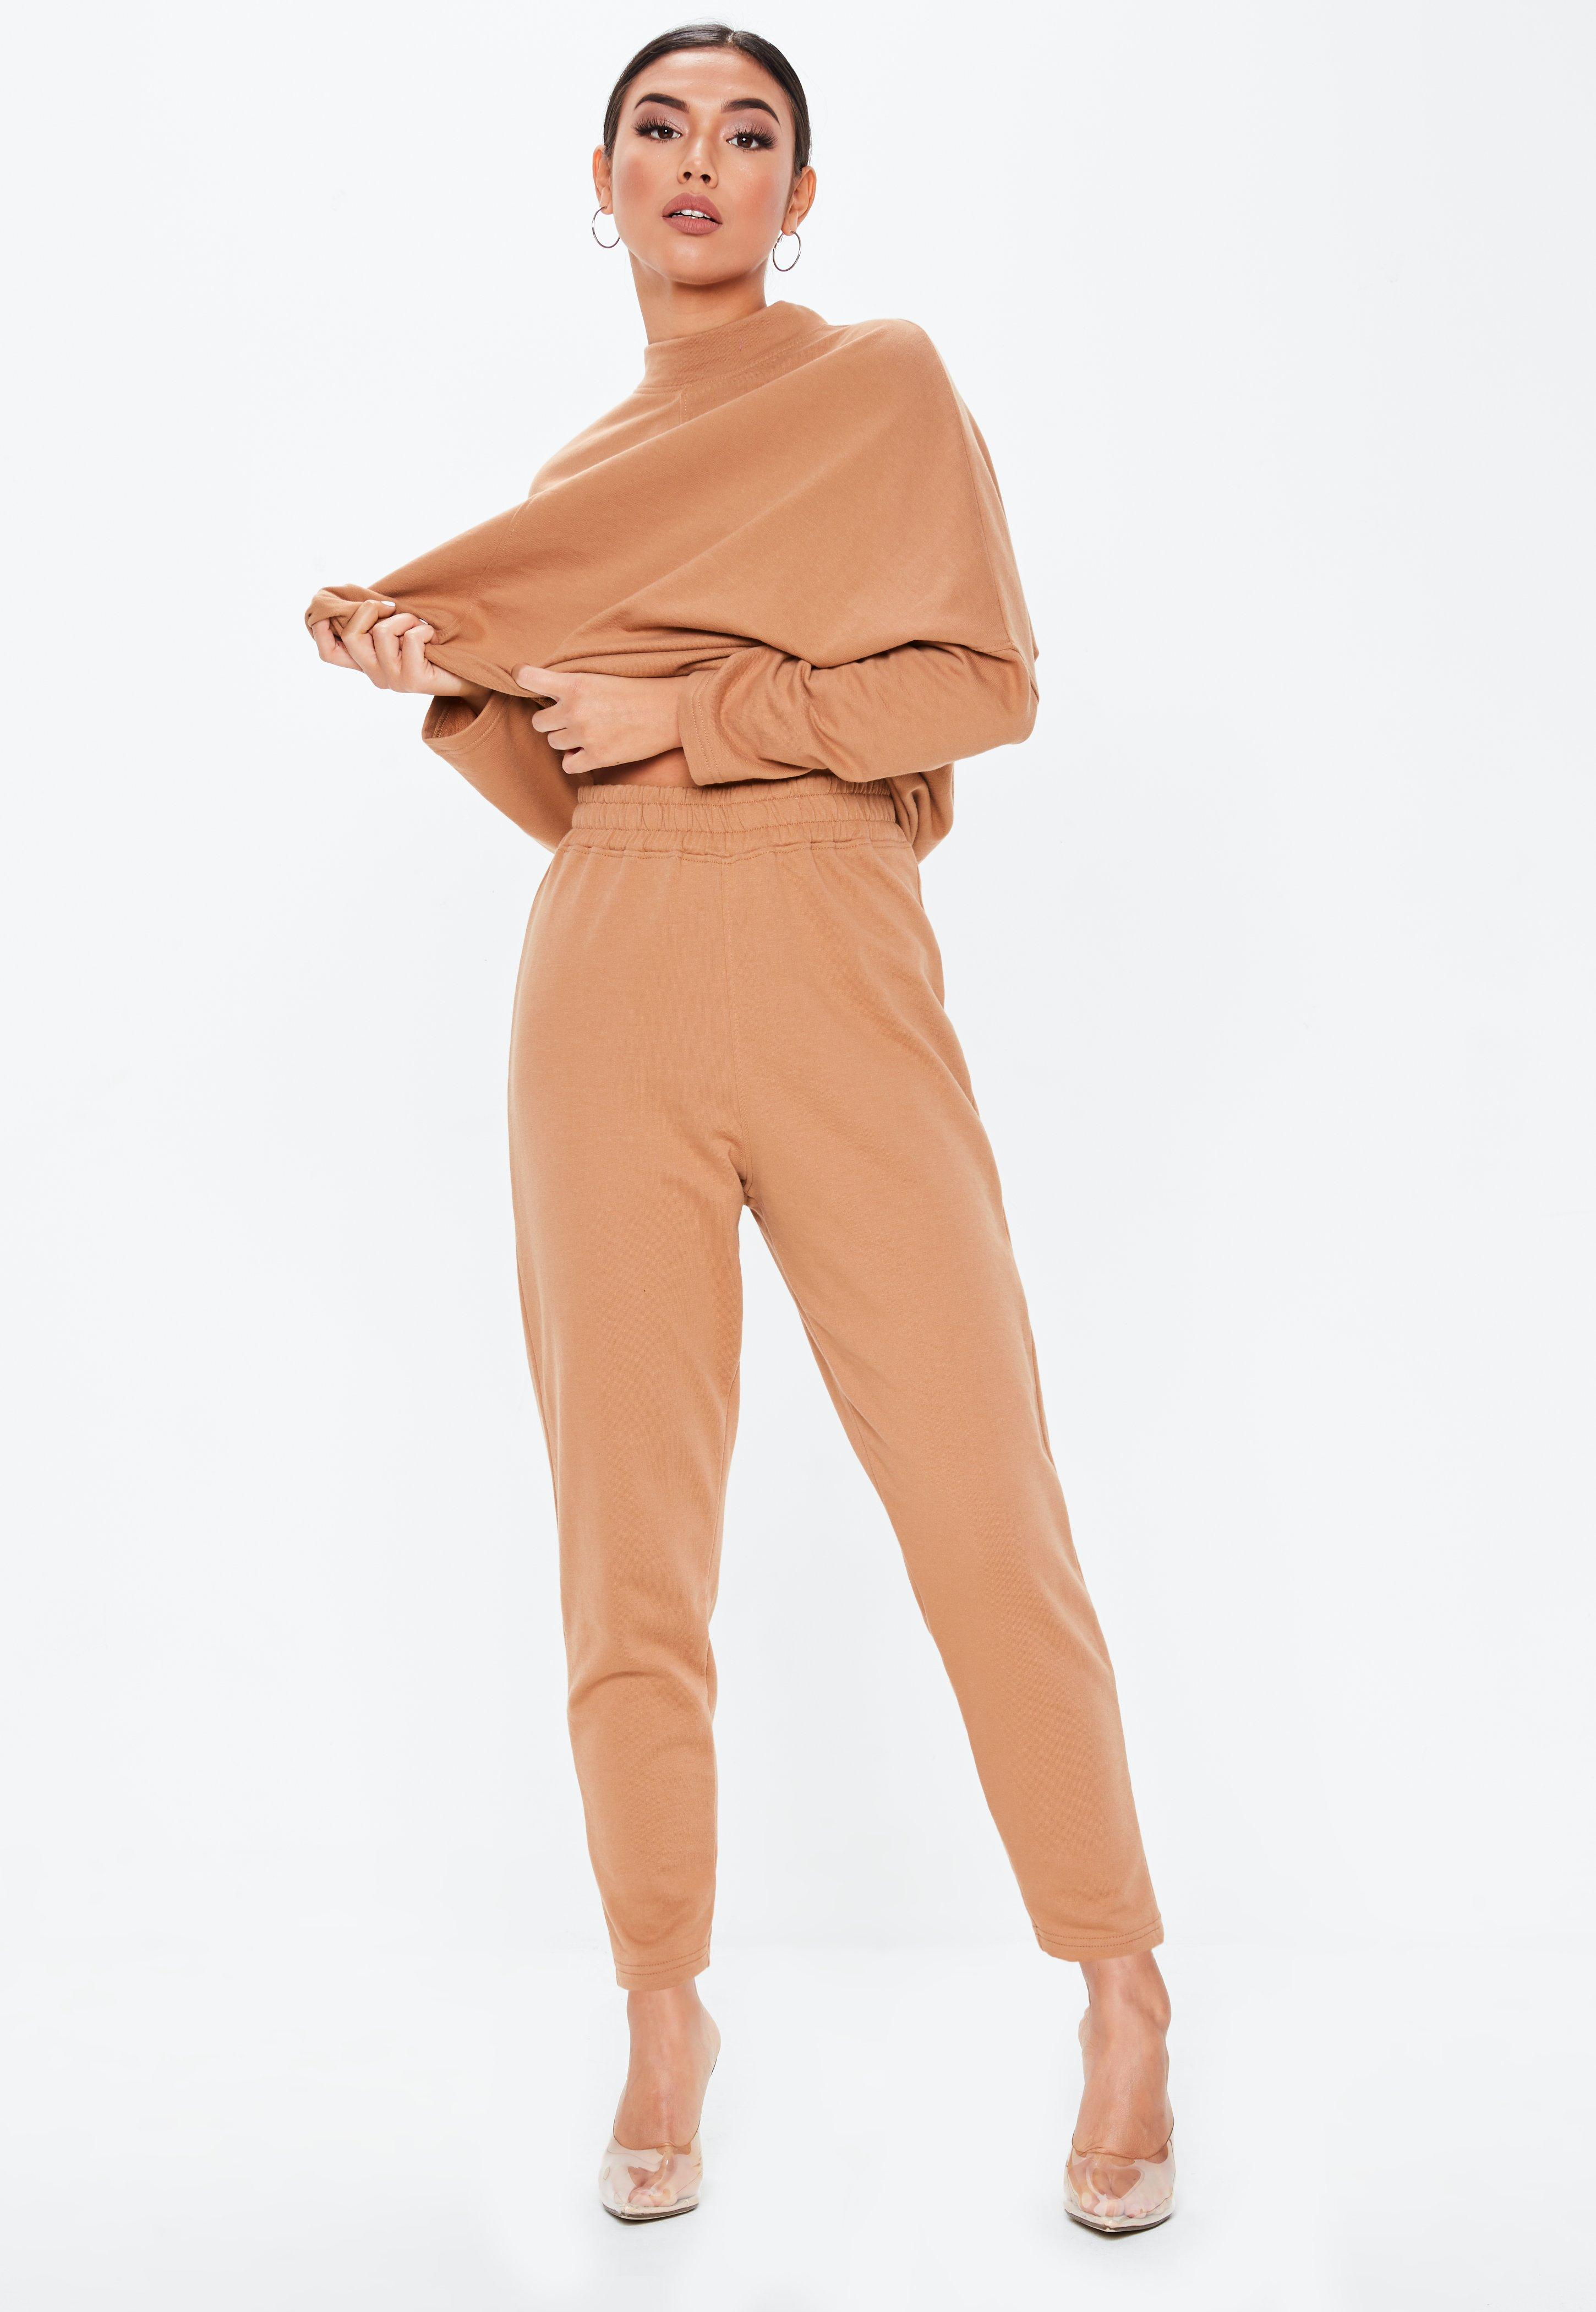 a6d4174a683a Tall Clothing